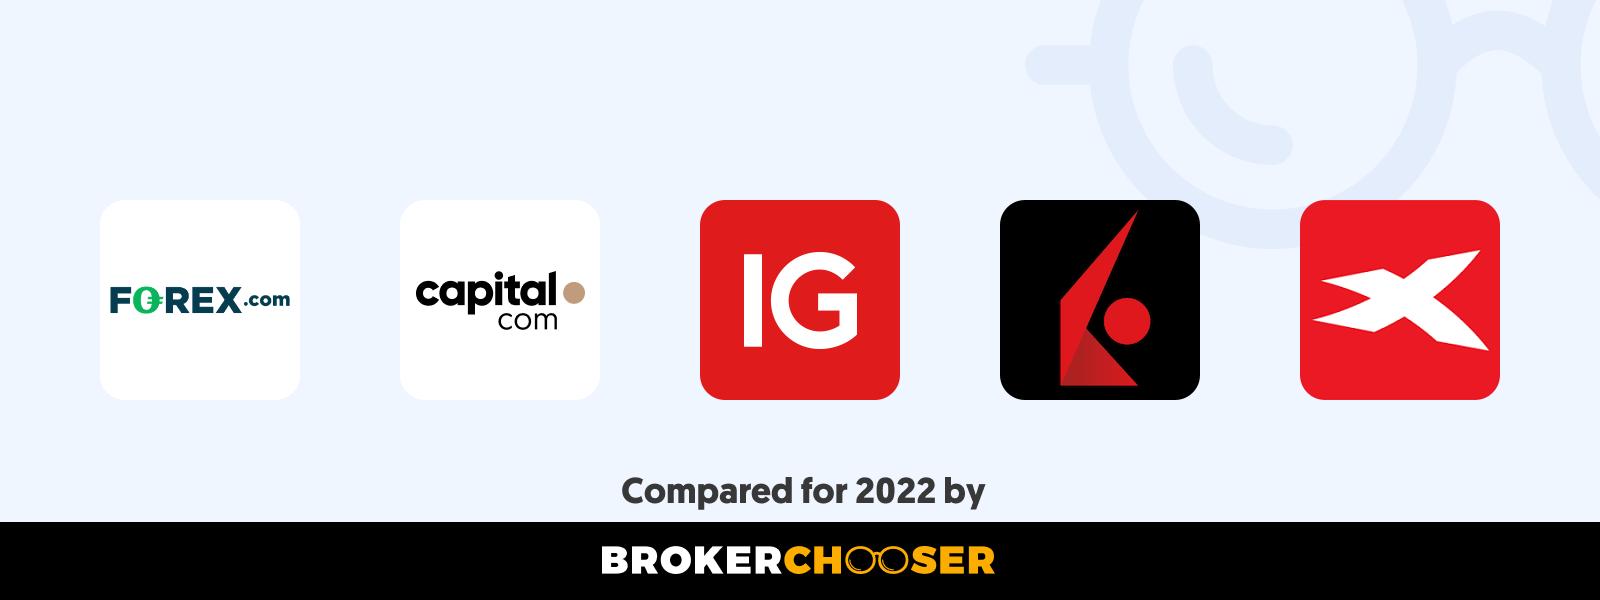 Best forex brokers for beginners in Anguilla in 2021